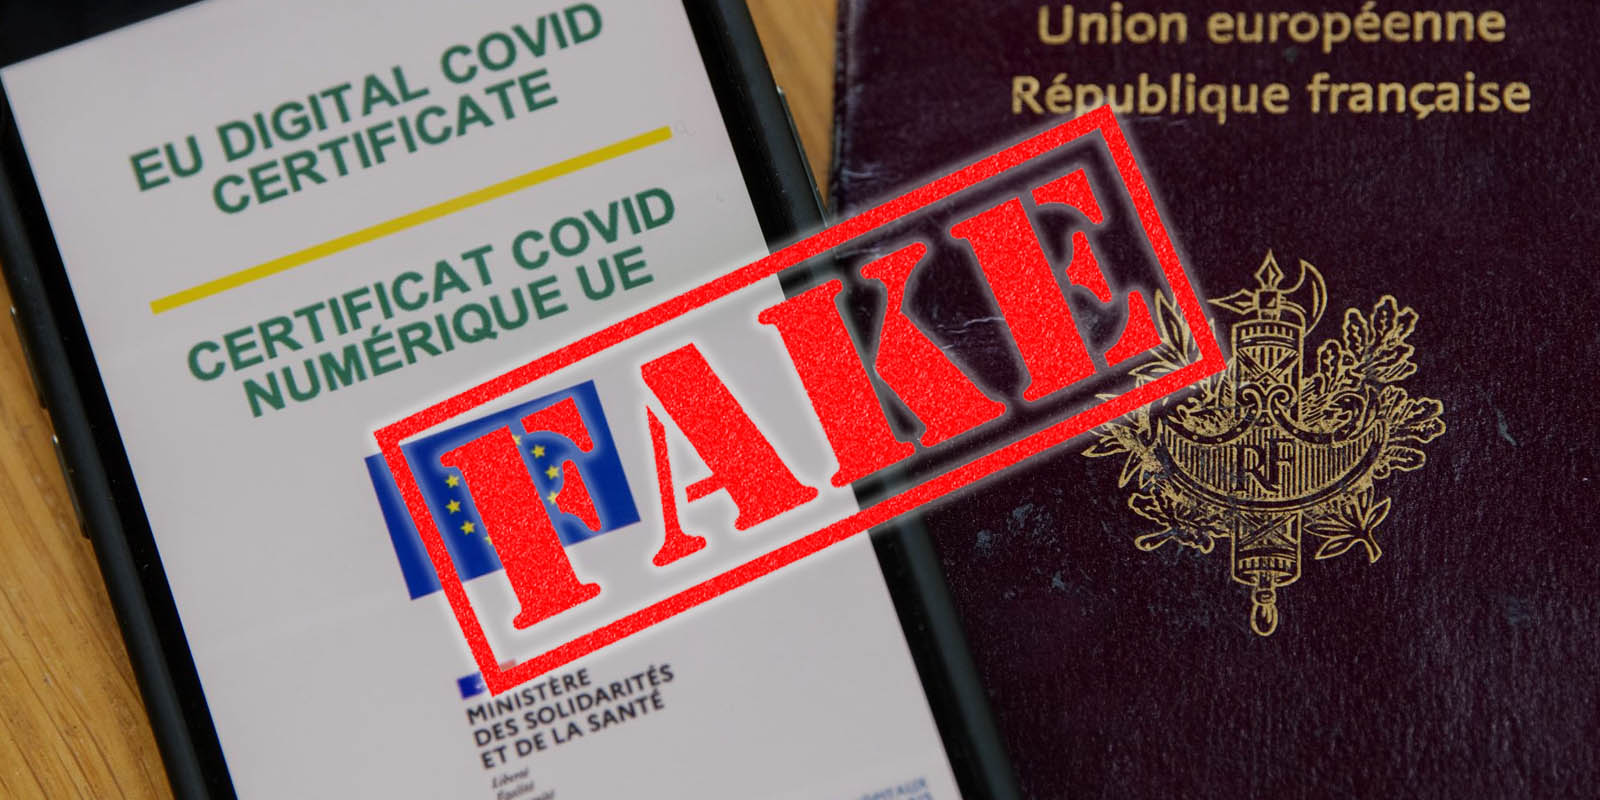 pasaportes covid falsos dark web